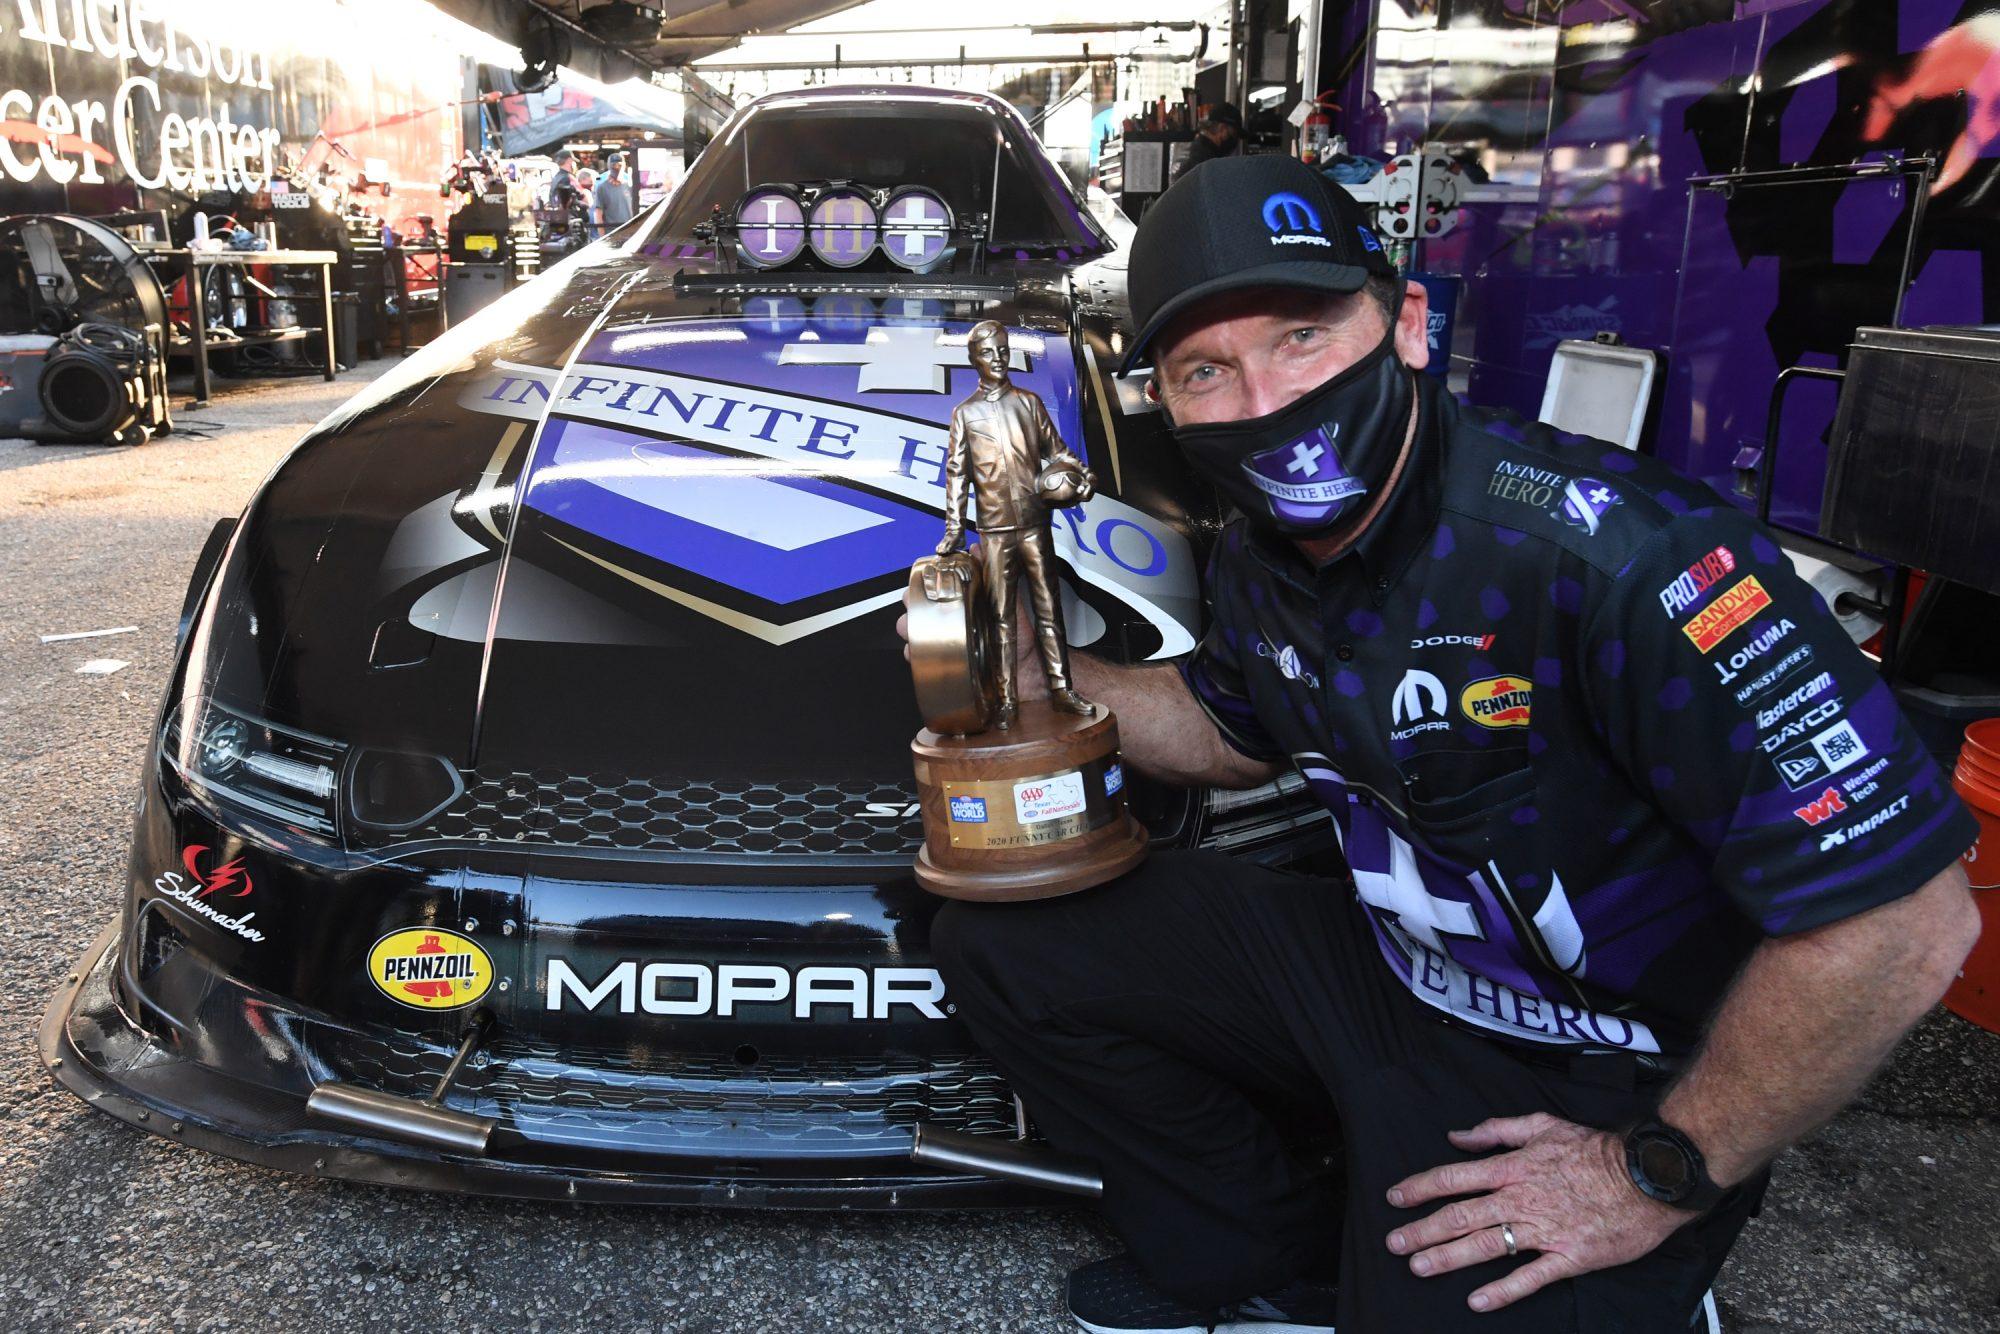 Jack Beckman holding his trophy